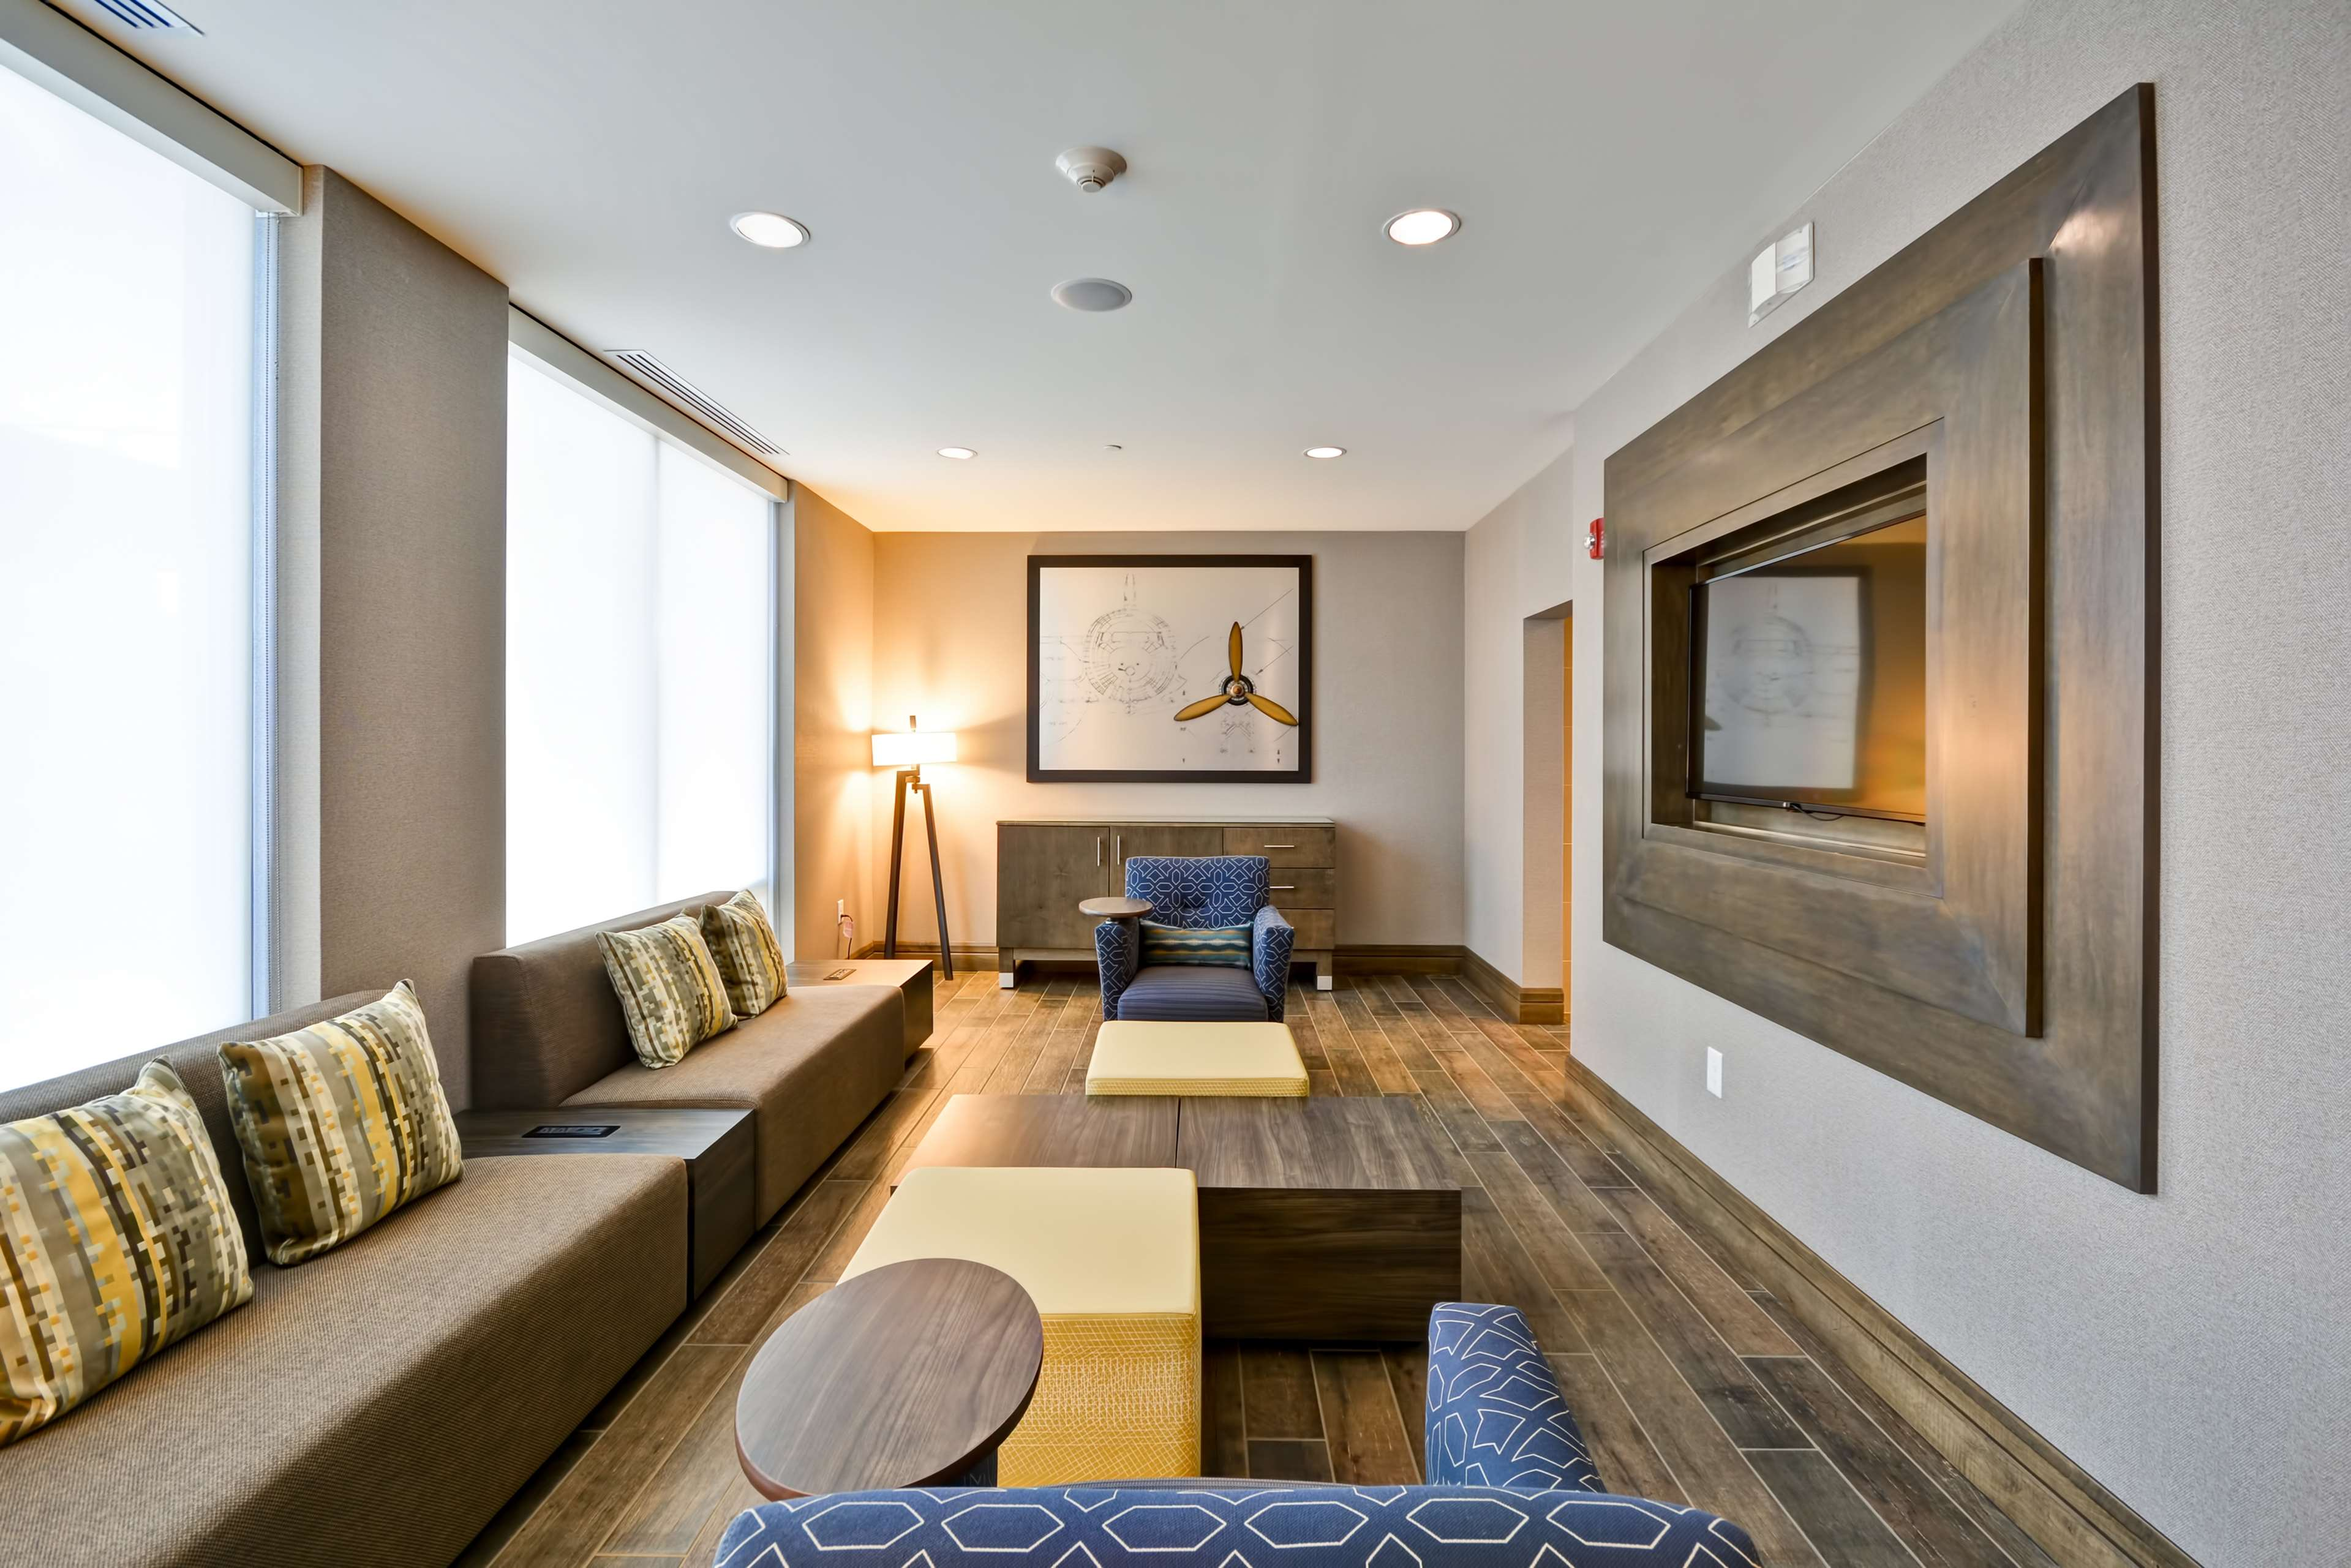 Home2 Suites by Hilton  St. Simons Island image 8